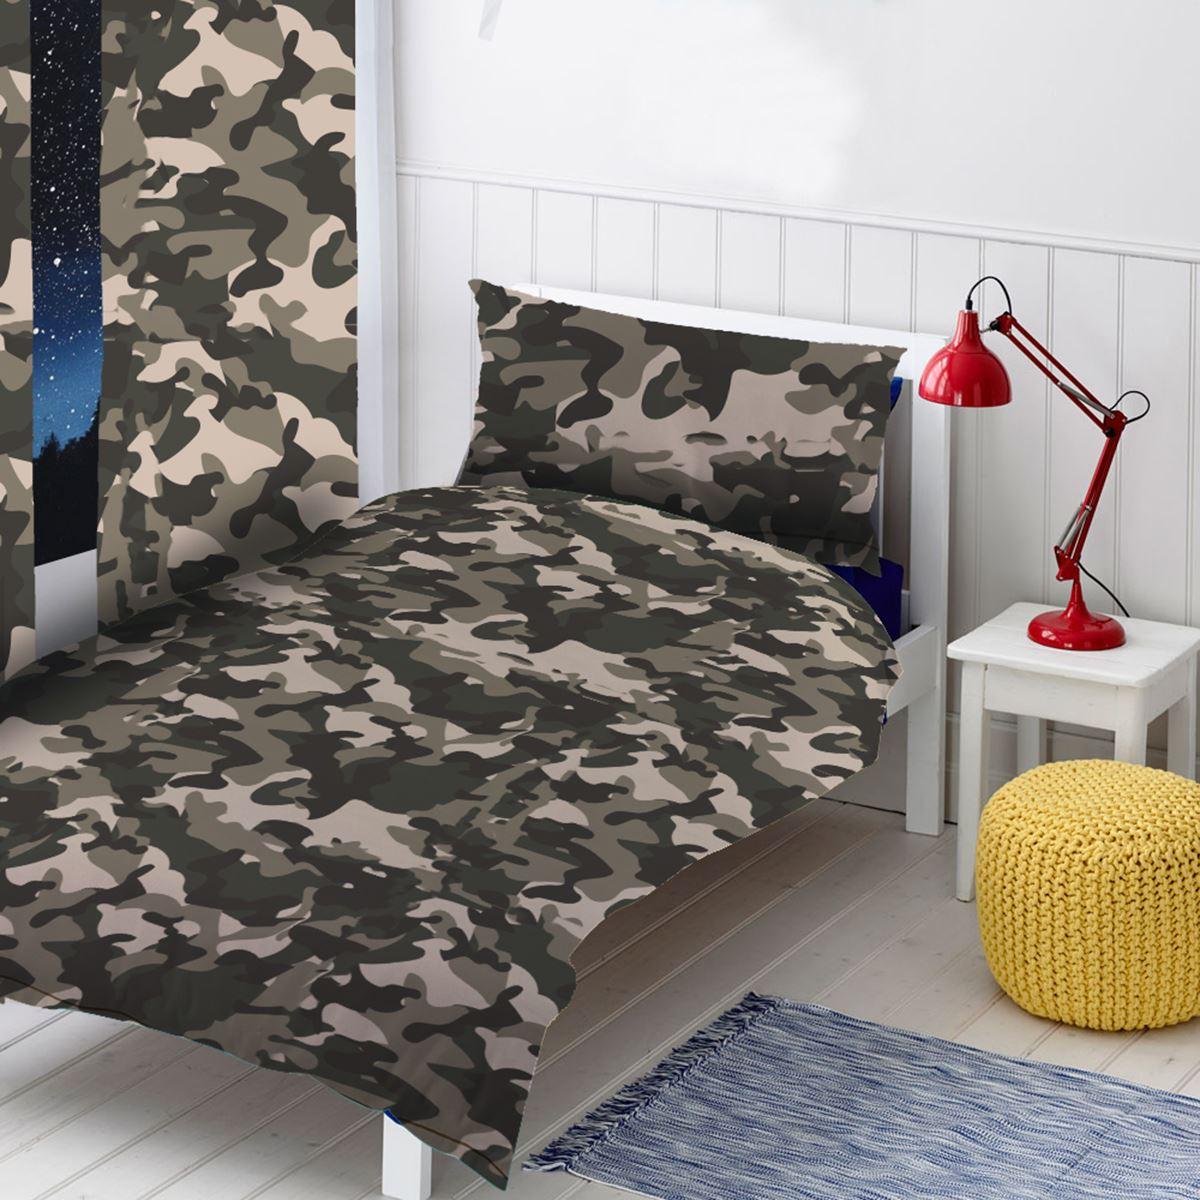 tarnfarbe grau blau rosa einzel doppel bettbezug set. Black Bedroom Furniture Sets. Home Design Ideas